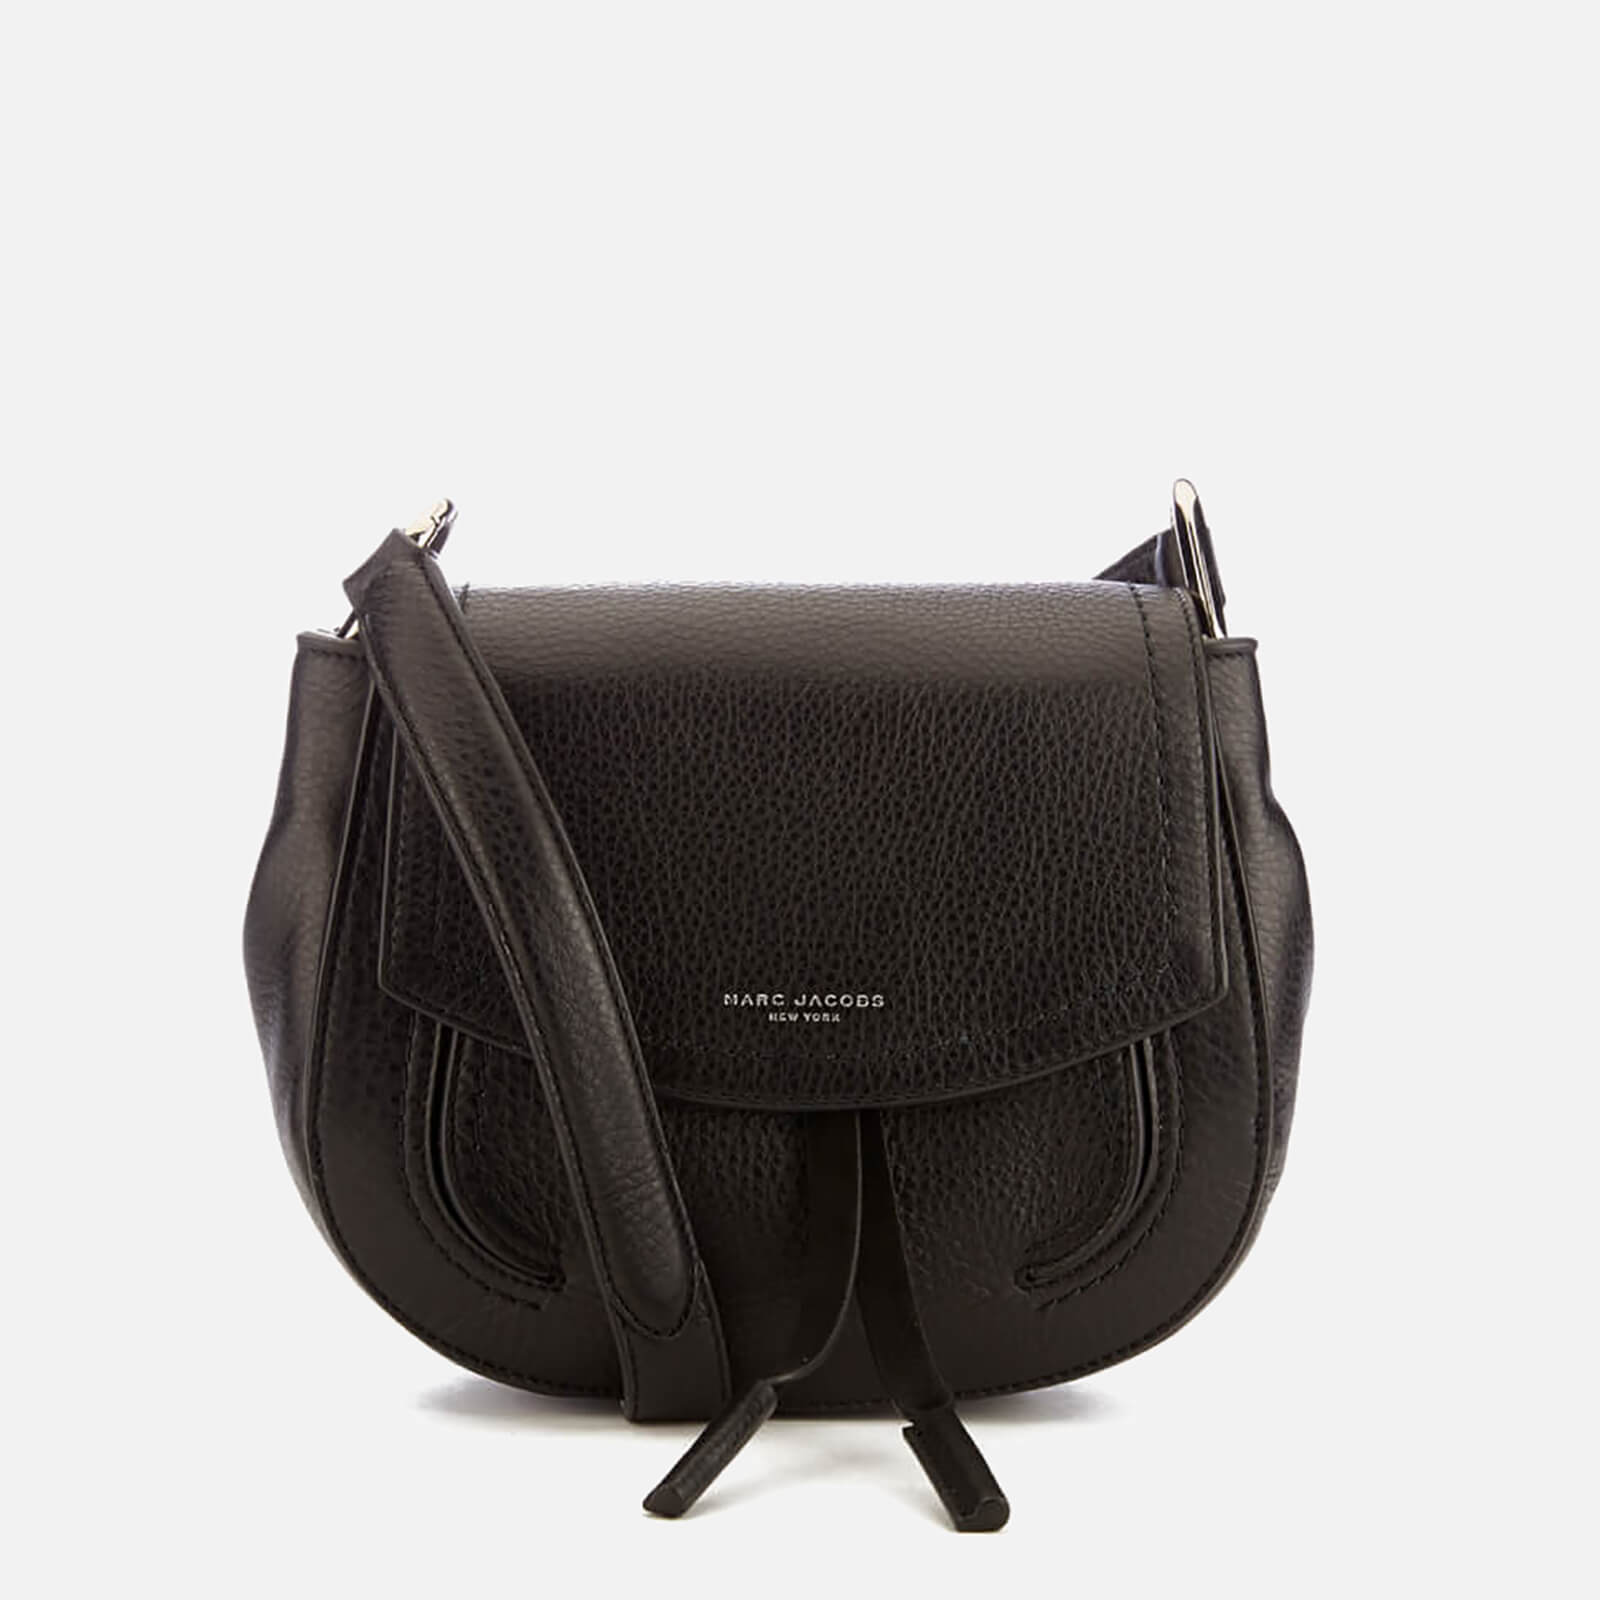 c5e502e66 Marc Jacobs Women's Maverick Mini Shoulder Bag - Black - Free UK Delivery  over £50